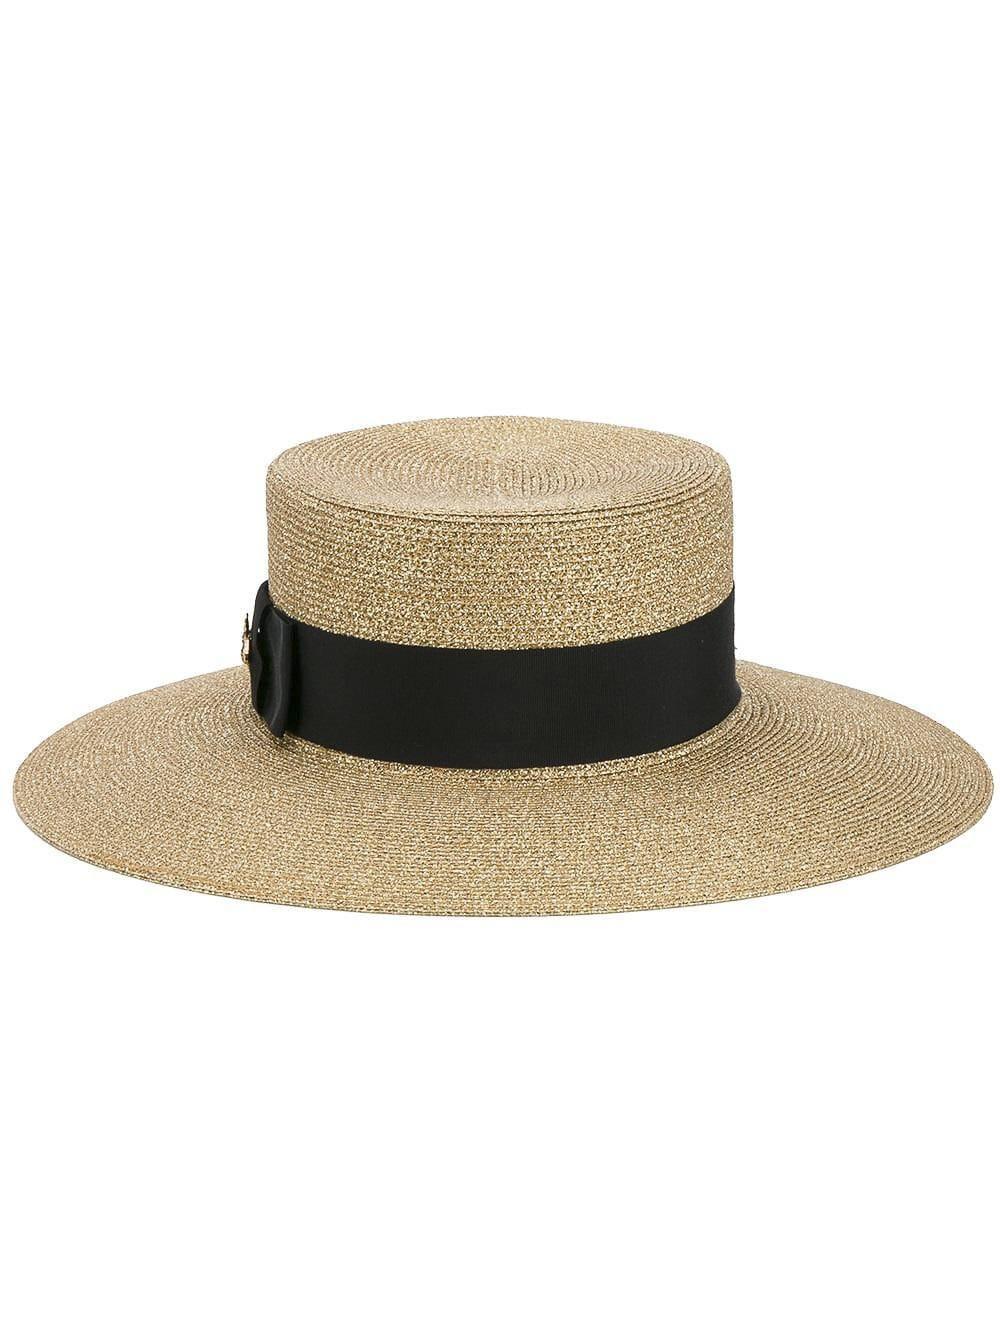 4baa2706483 Gucci Grosgrain-Trimmed Glittered Straw Hat In Gold